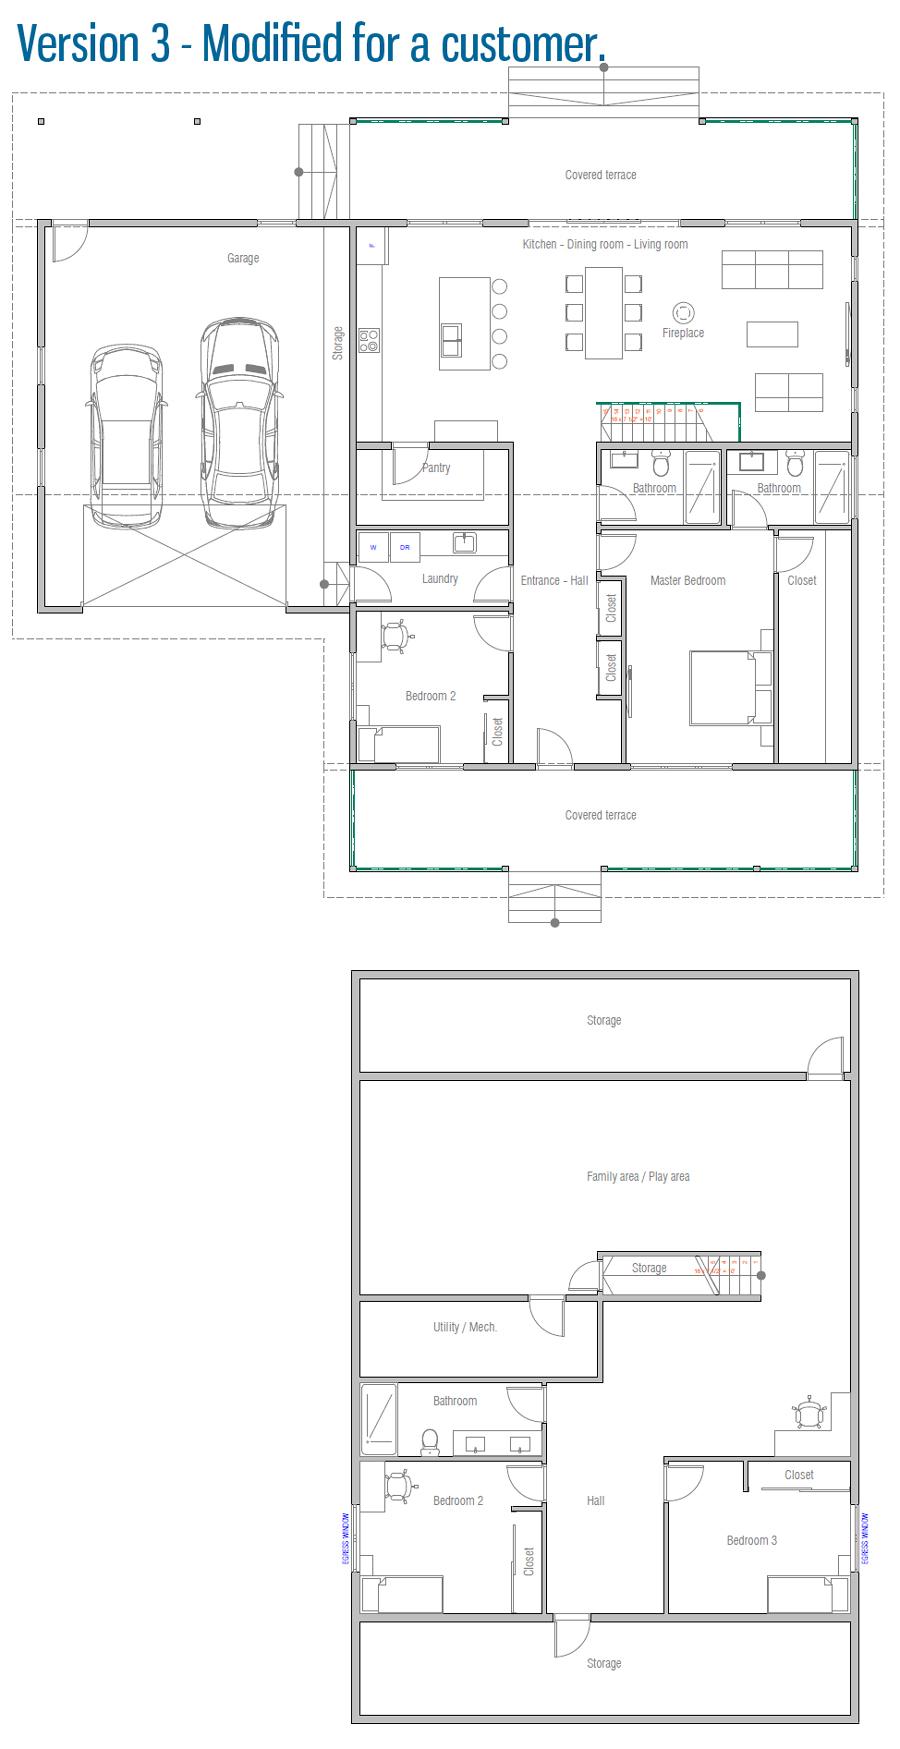 affordable-homes_33_CH598_V3.jpg